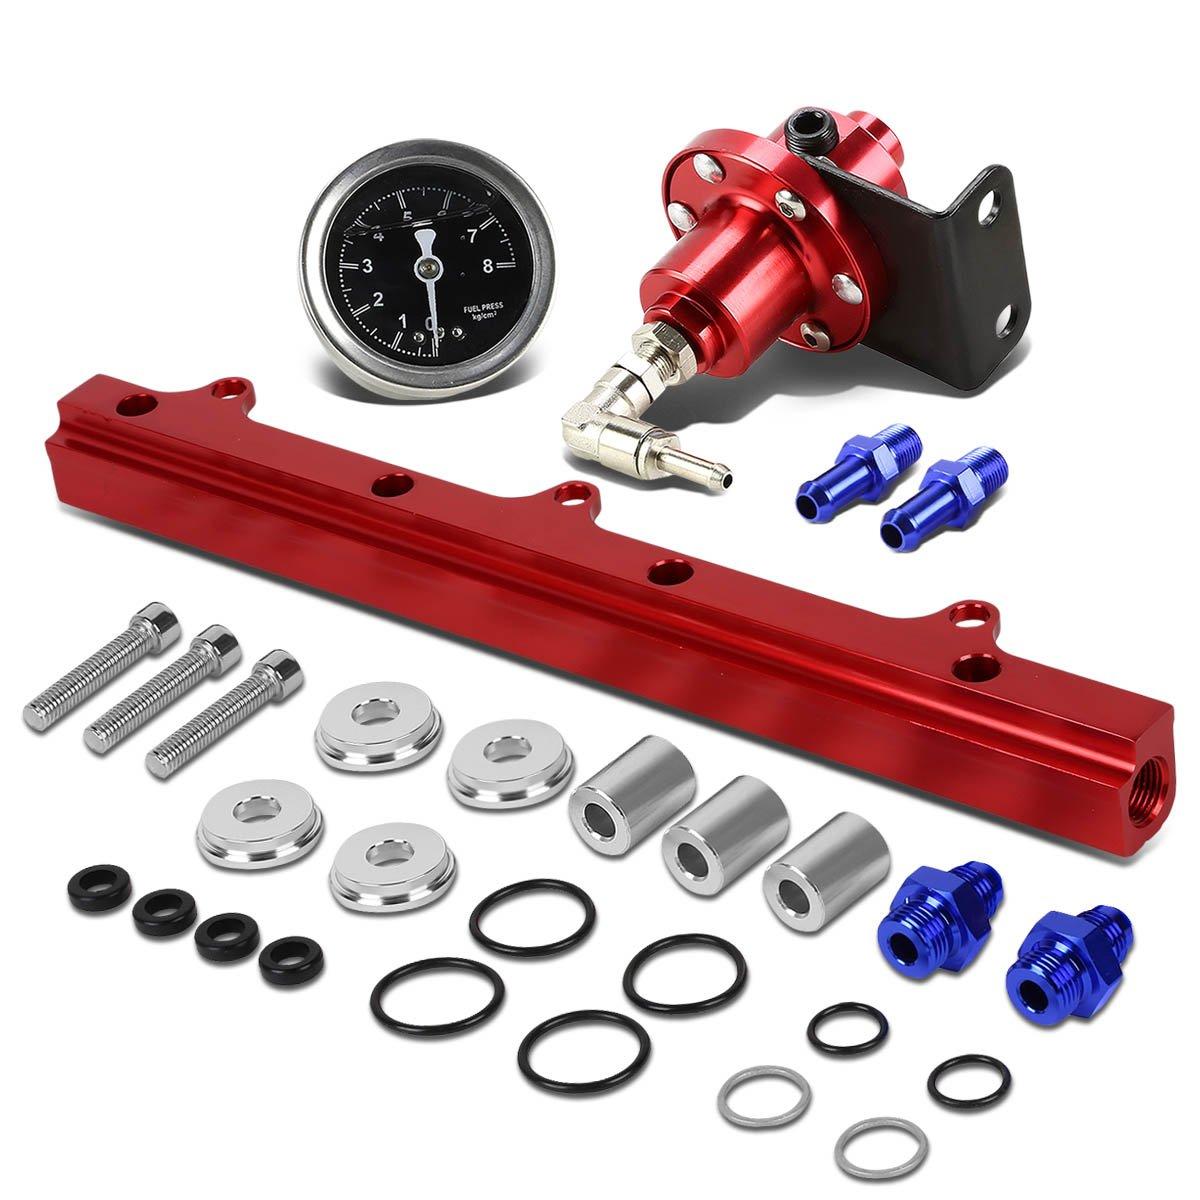 For Honda B-Series Top Feed Fuel Injector Rail Kit (Black)+Fuel Pressure Regulator (Red) Auto Dynasty